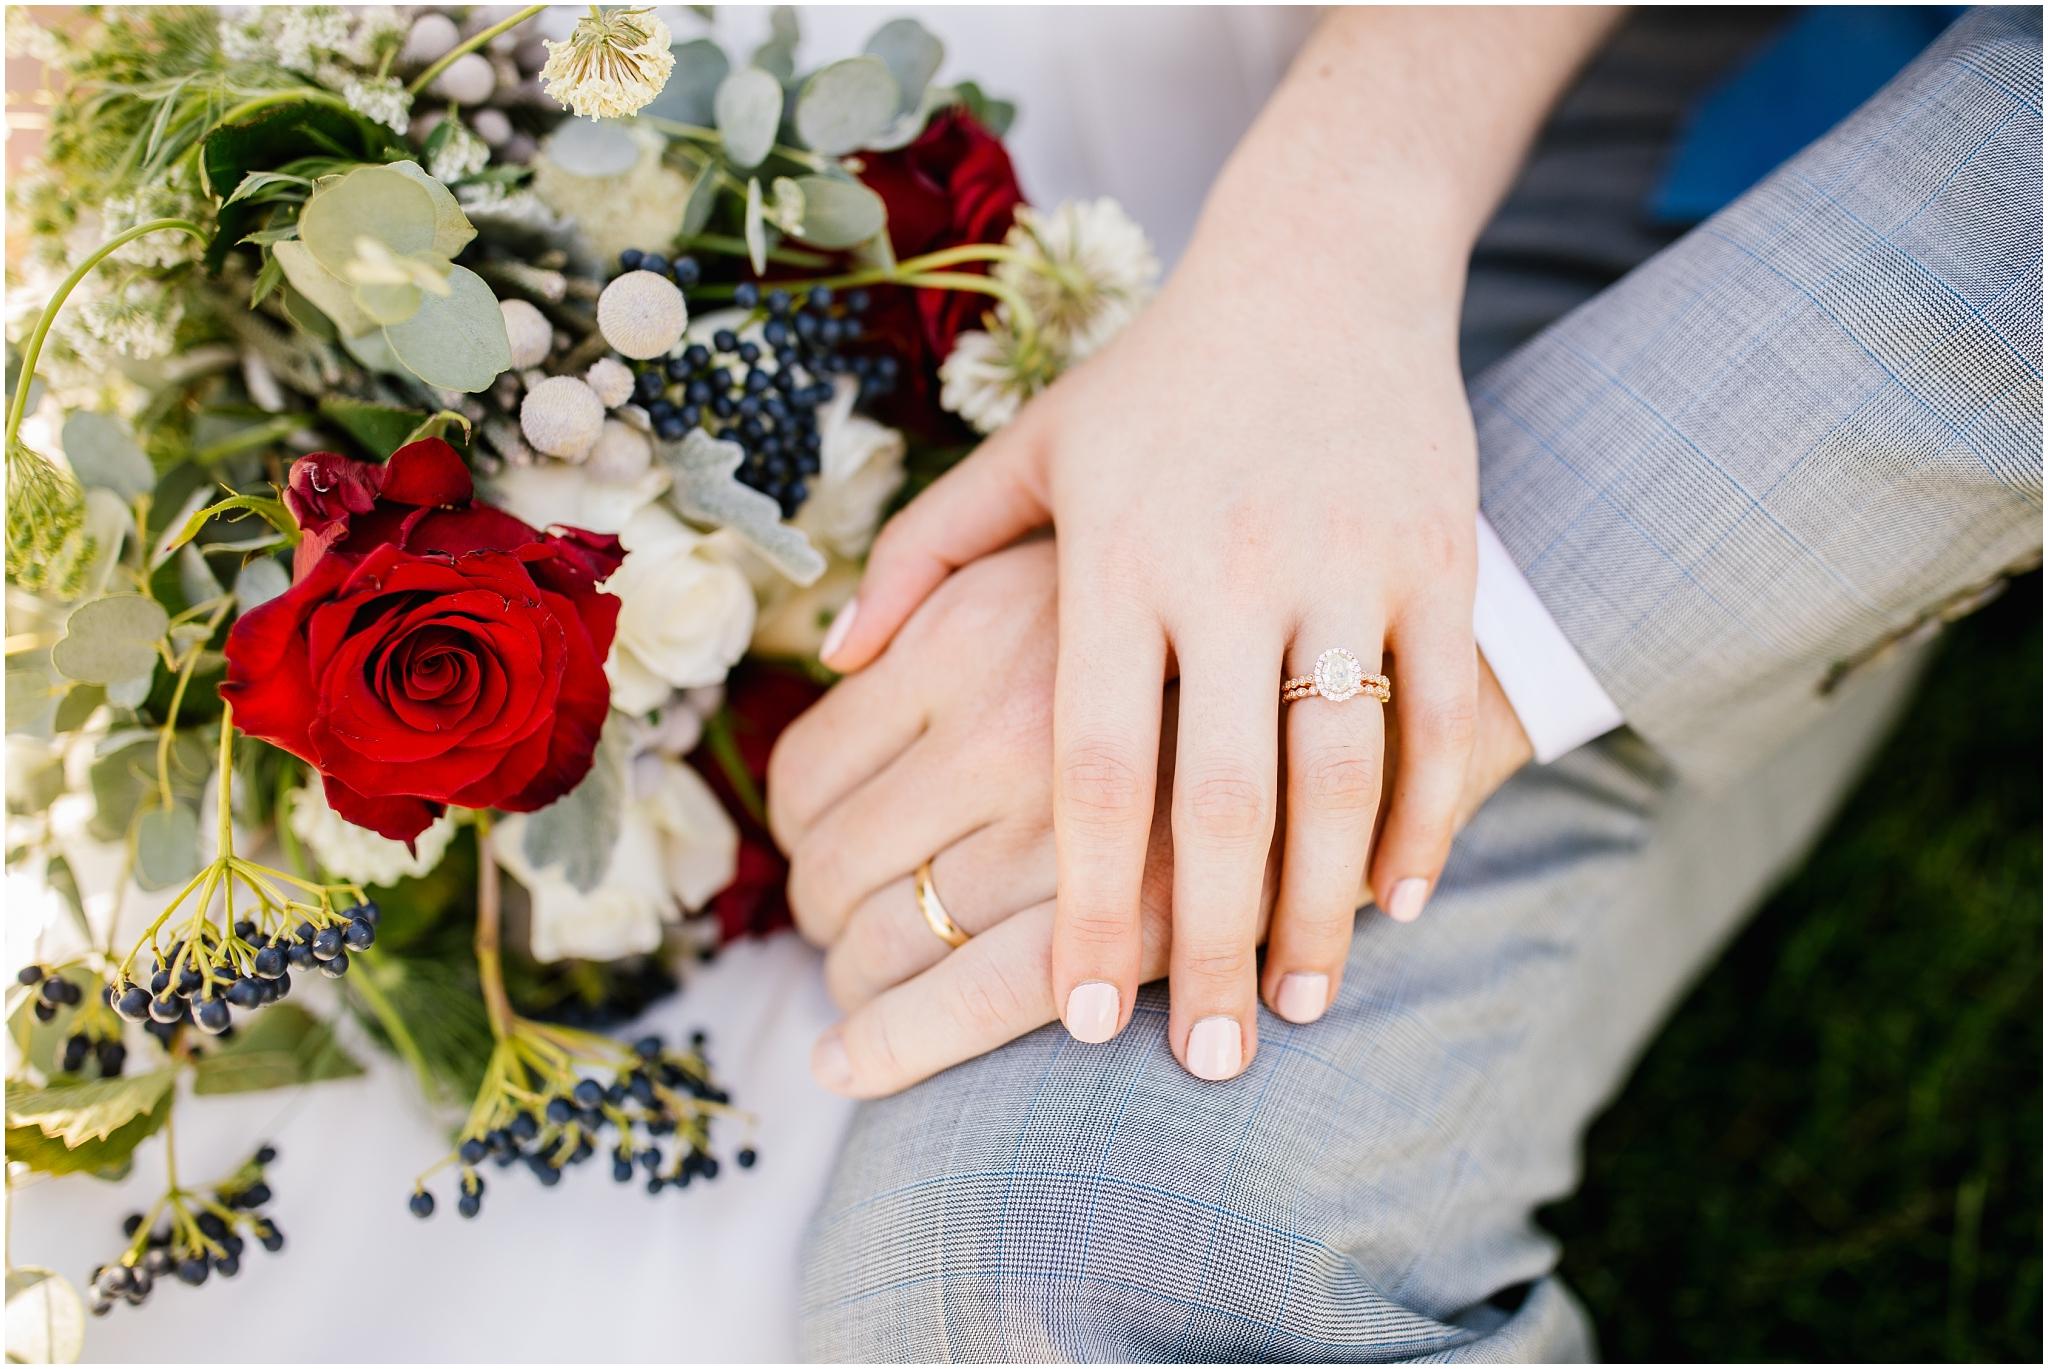 BrynneWinston-155_Lizzie-B-Imagery-Utah-Wedding-Photographer-Utah-County-Manti-Temple.jpg